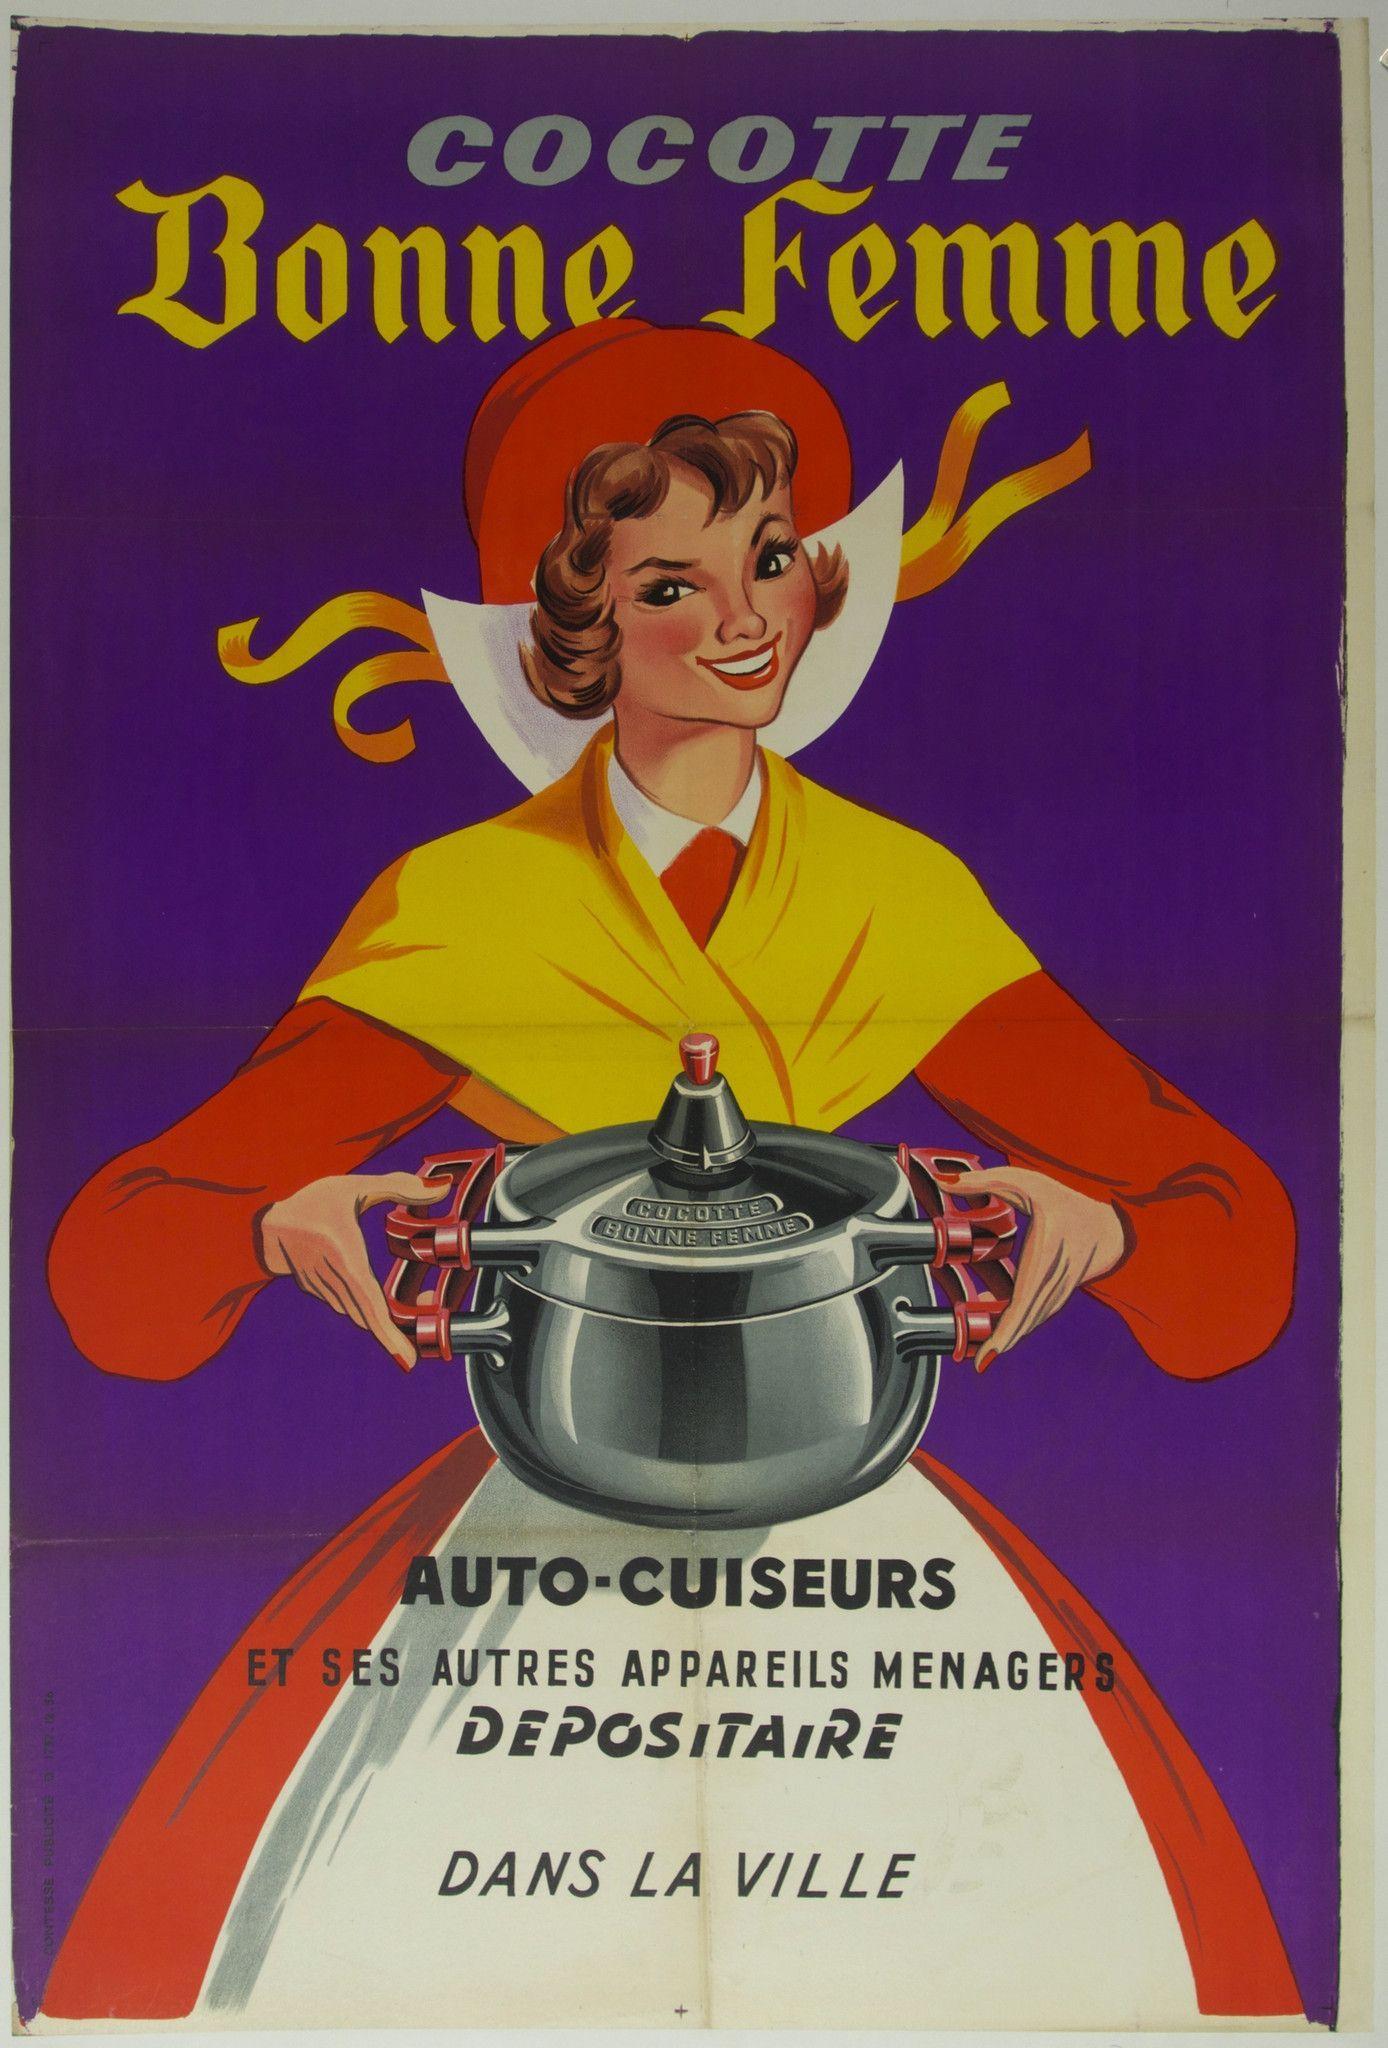 cocotte bonne femme french ads and posters pinterest. Black Bedroom Furniture Sets. Home Design Ideas